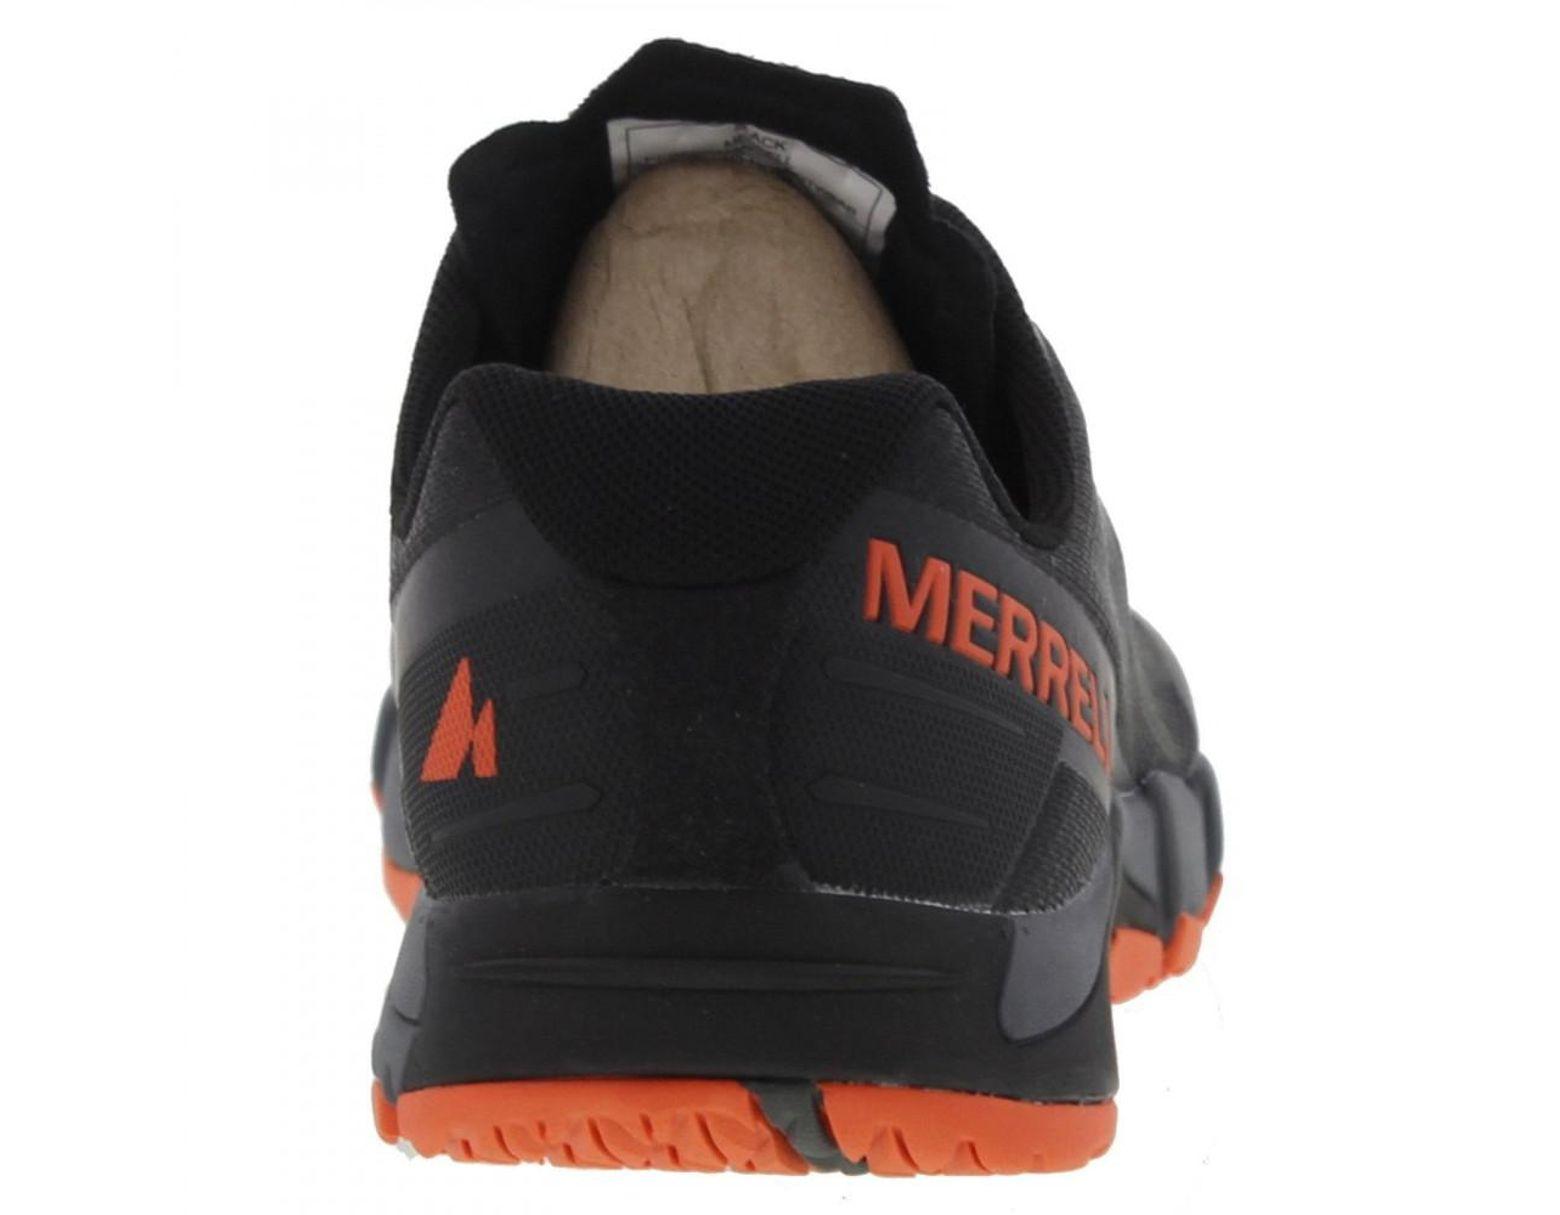 cca88941de5c2 Merrell Bare Access Flex Barefoot Vegan Running Walking Shoes in Black for  Men - Lyst